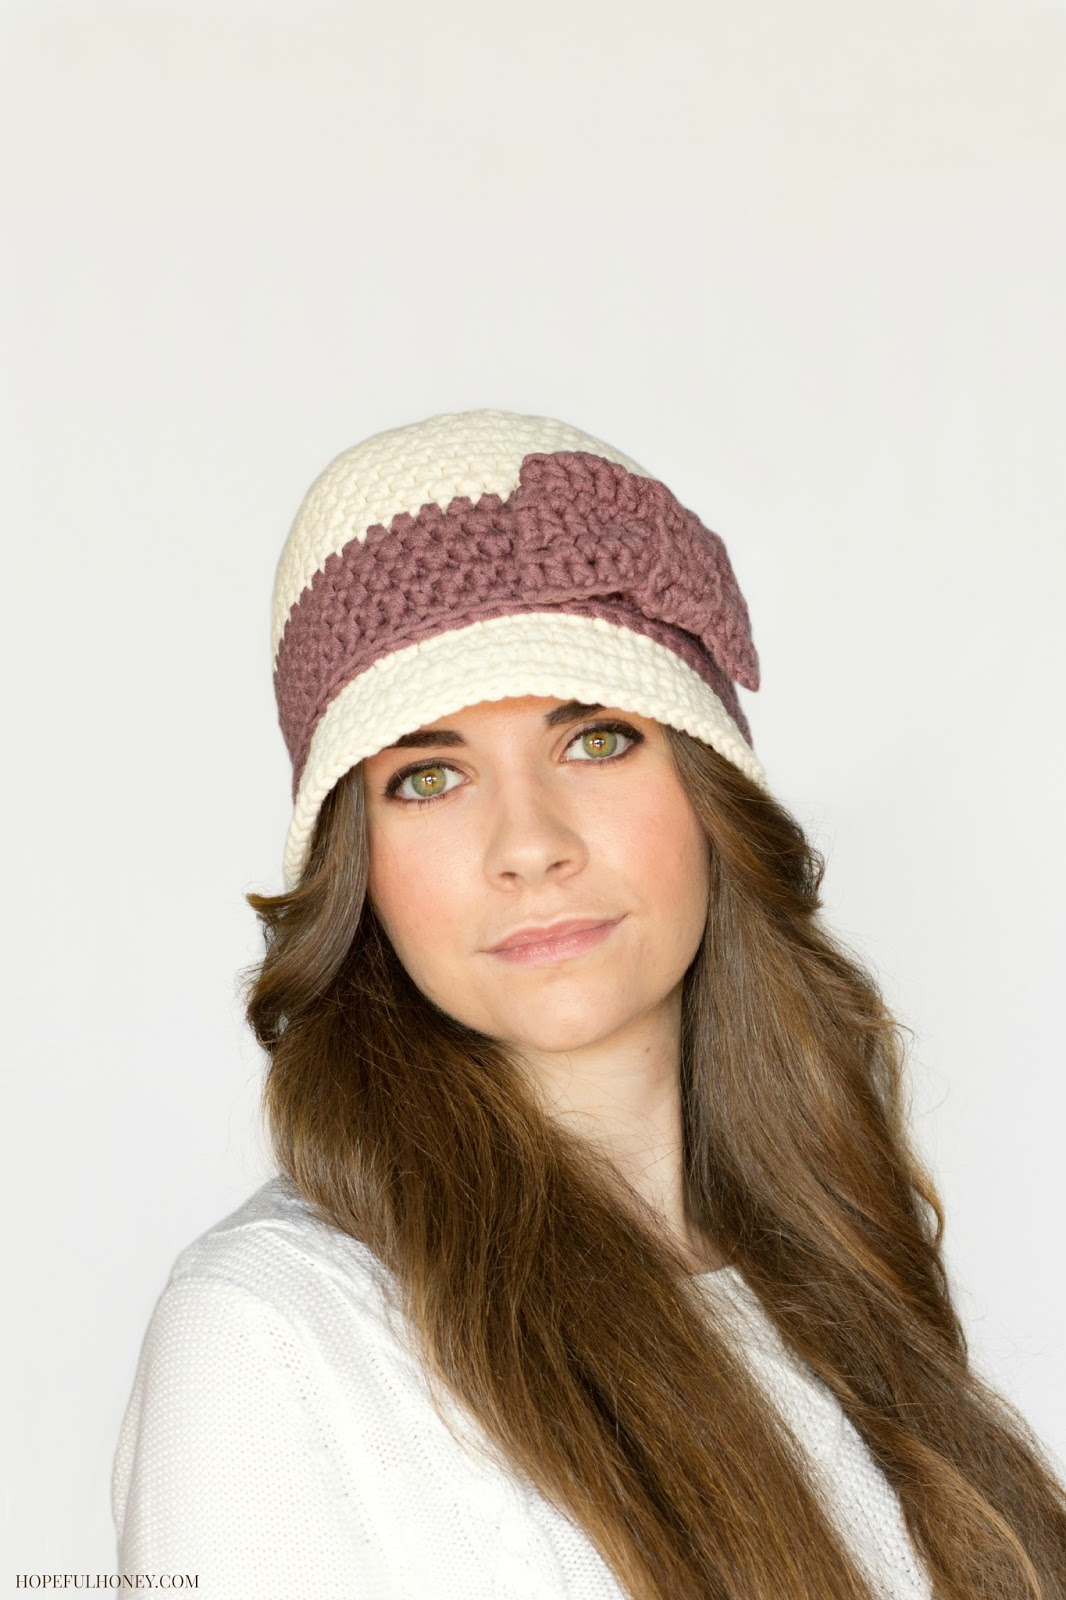 Pattern Crochet Cloche Hat : Hopeful Honey Craft, Crochet, Create: Downton Abbey ...